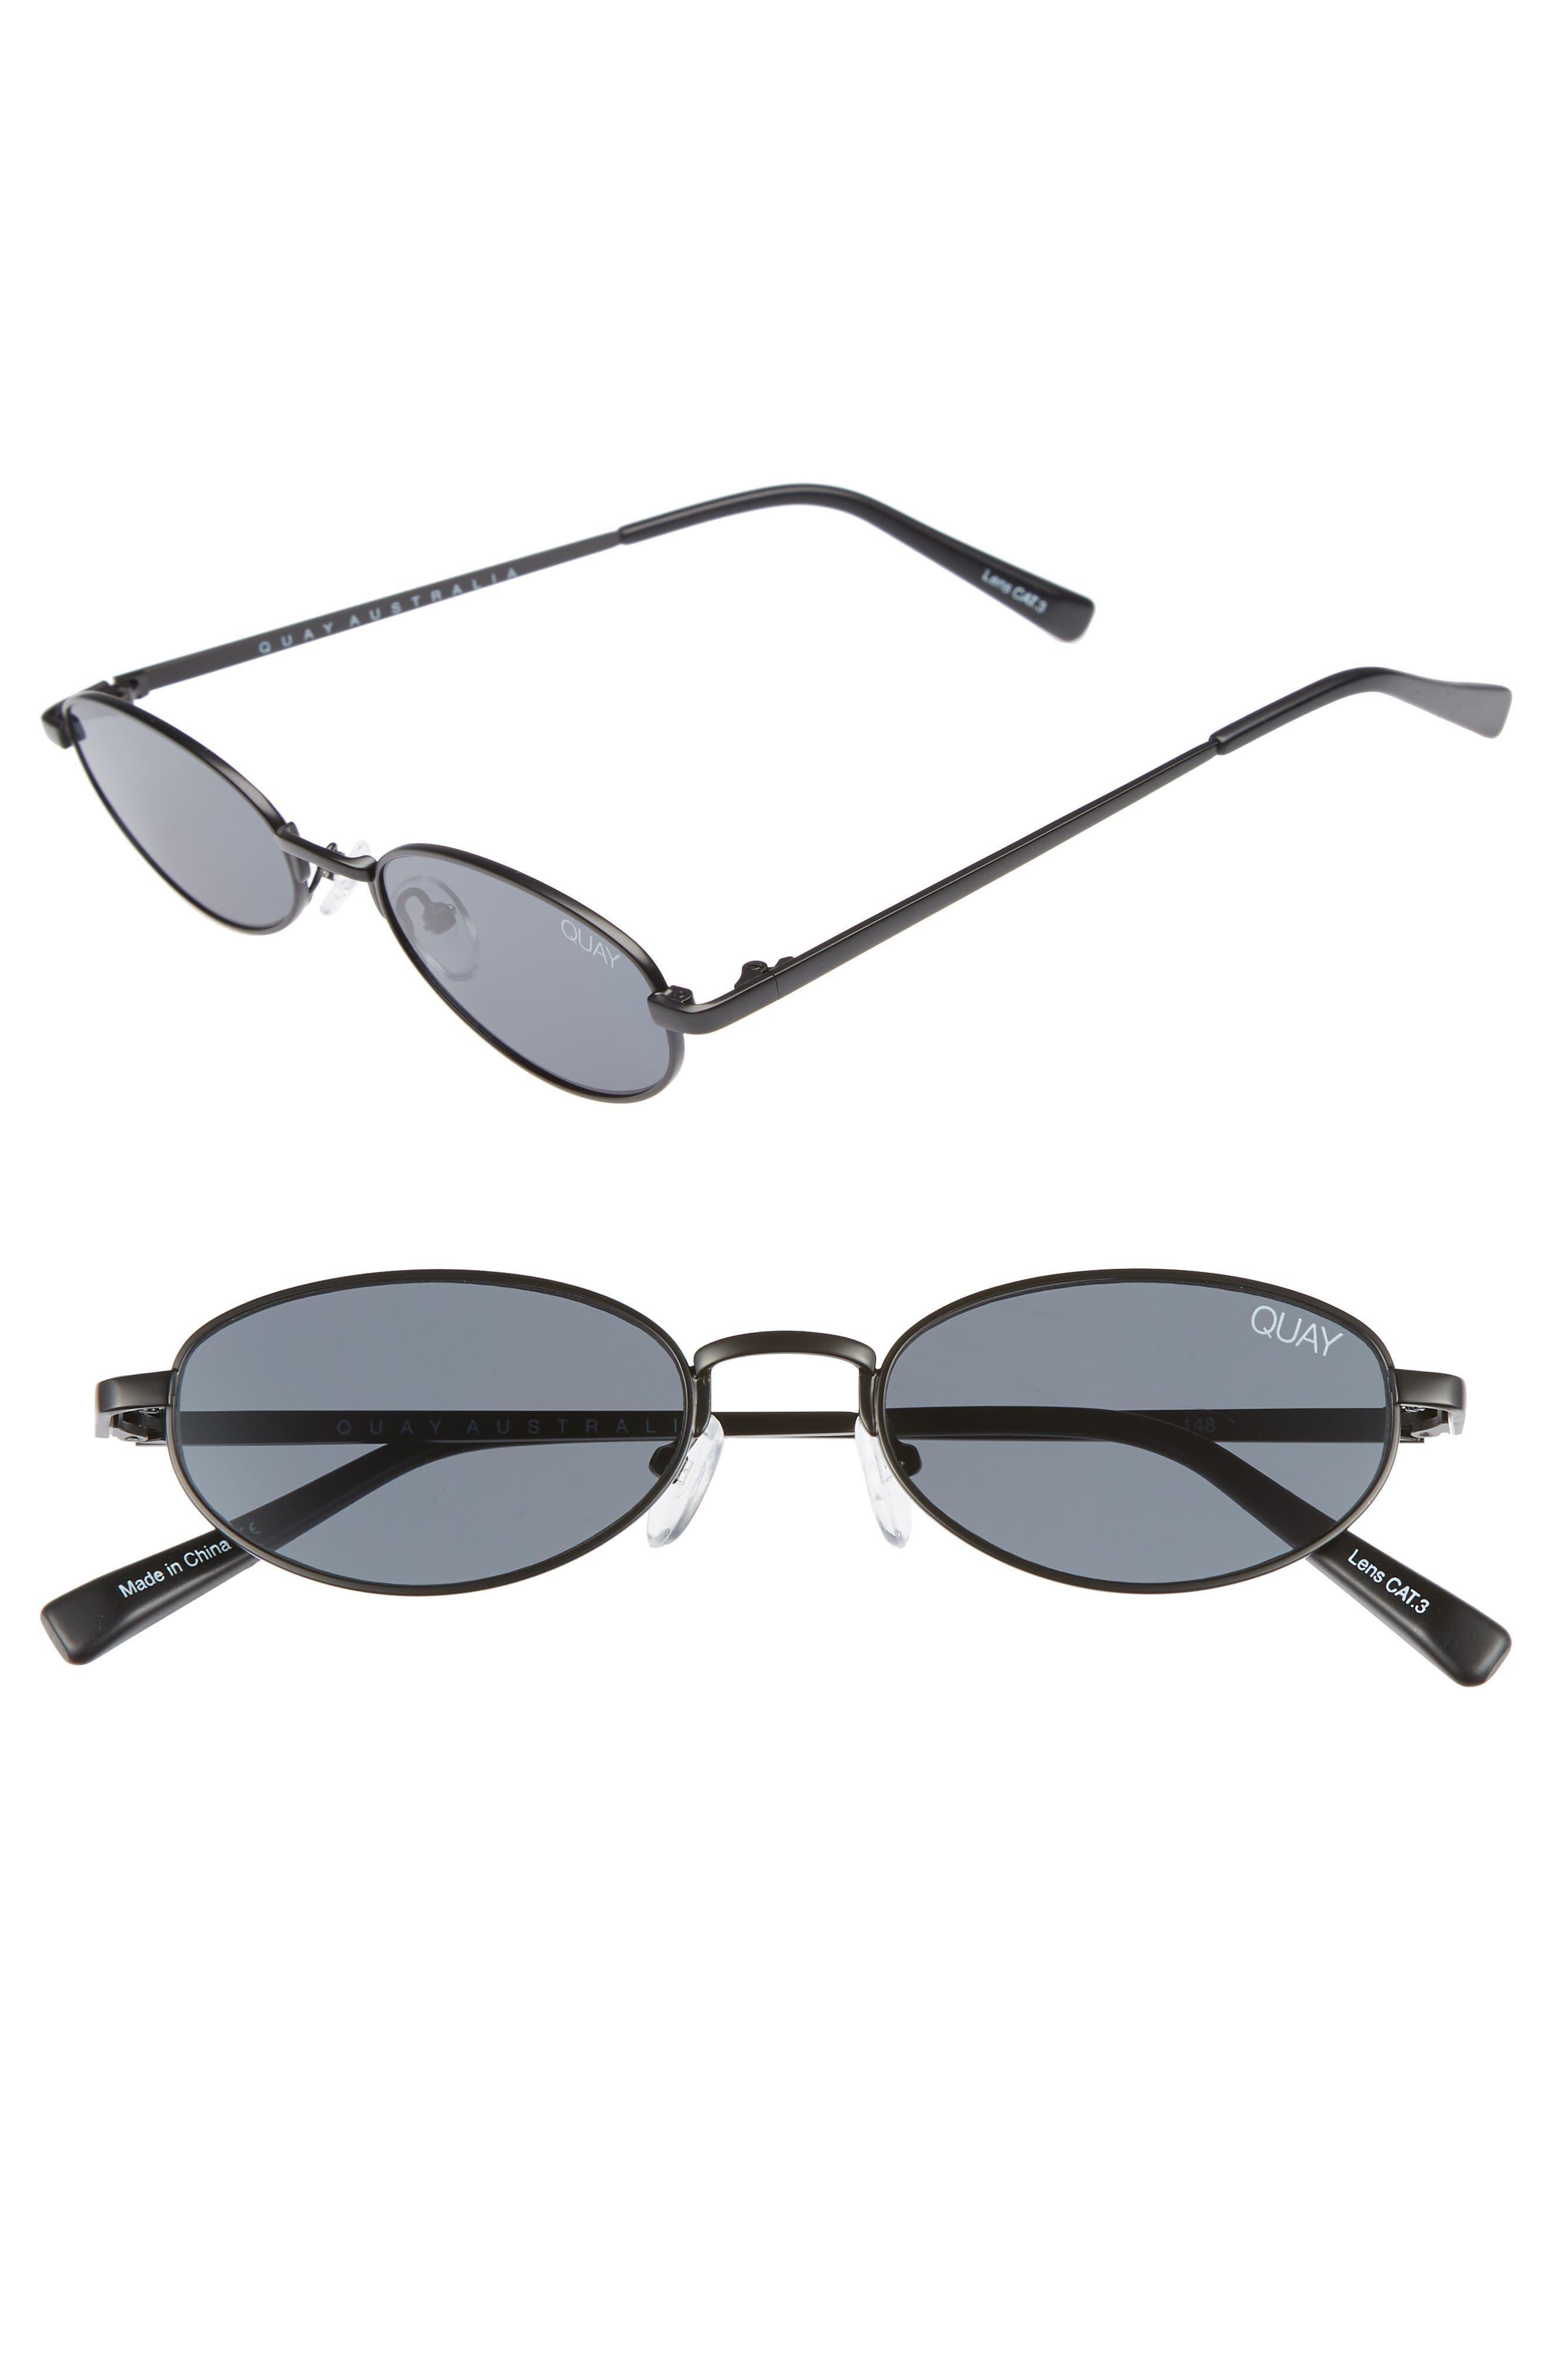 49mm Showdown Oval Sunglasses,                         Main,                         color, BLACK/ SMOKE